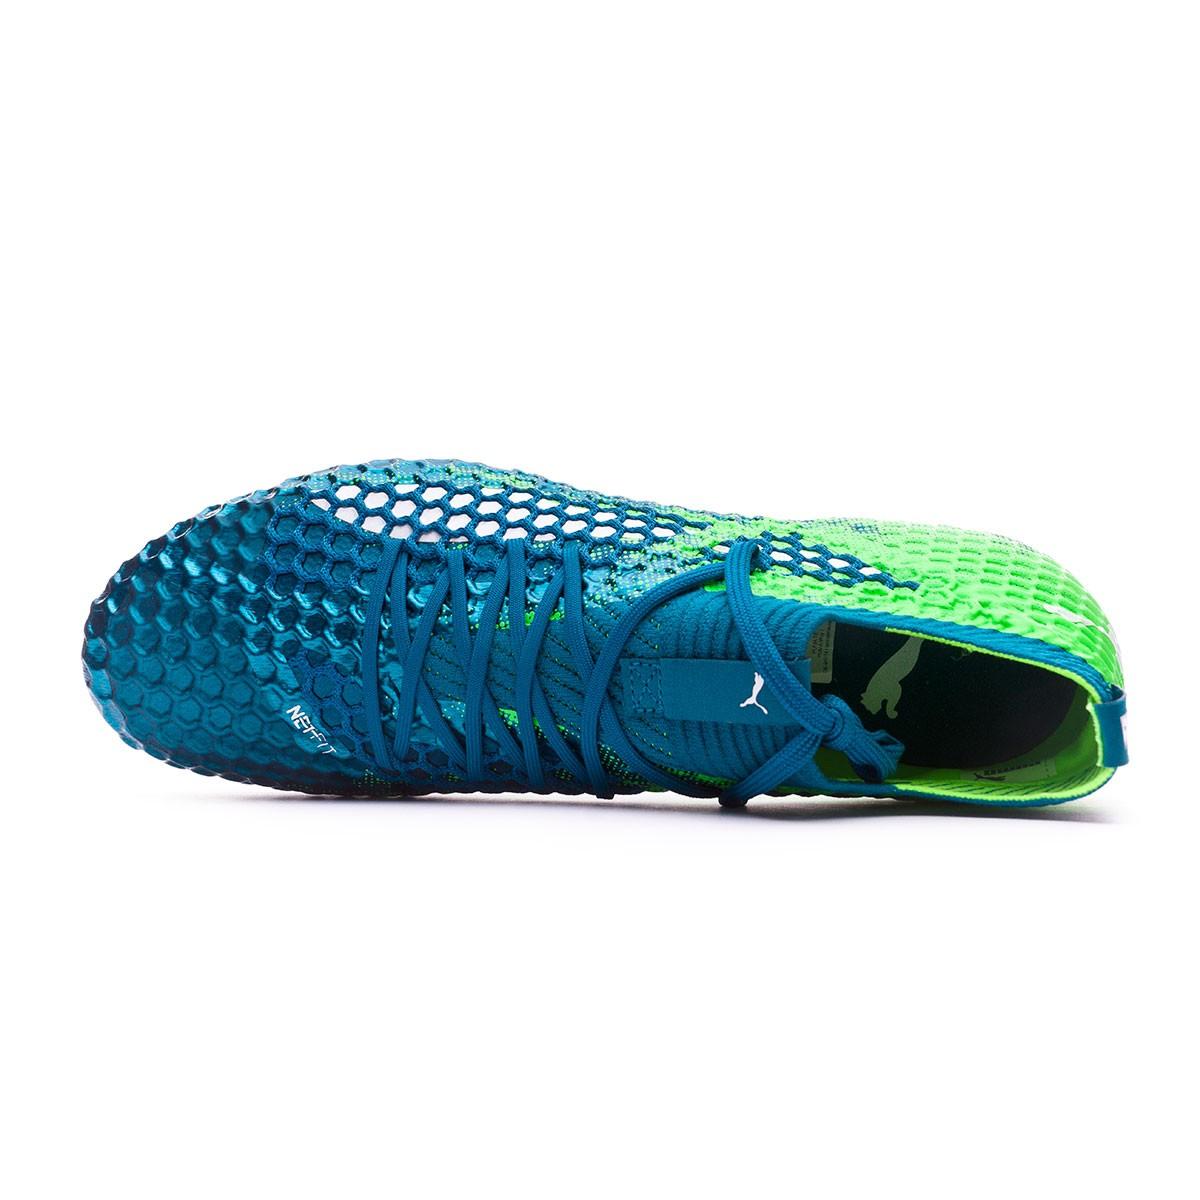 84b01efeeff69f Boot Puma Future 18.1 Netfit hyFG Deep Lagoon-Puma white-Green gecko -  Football store Fútbol Emotion